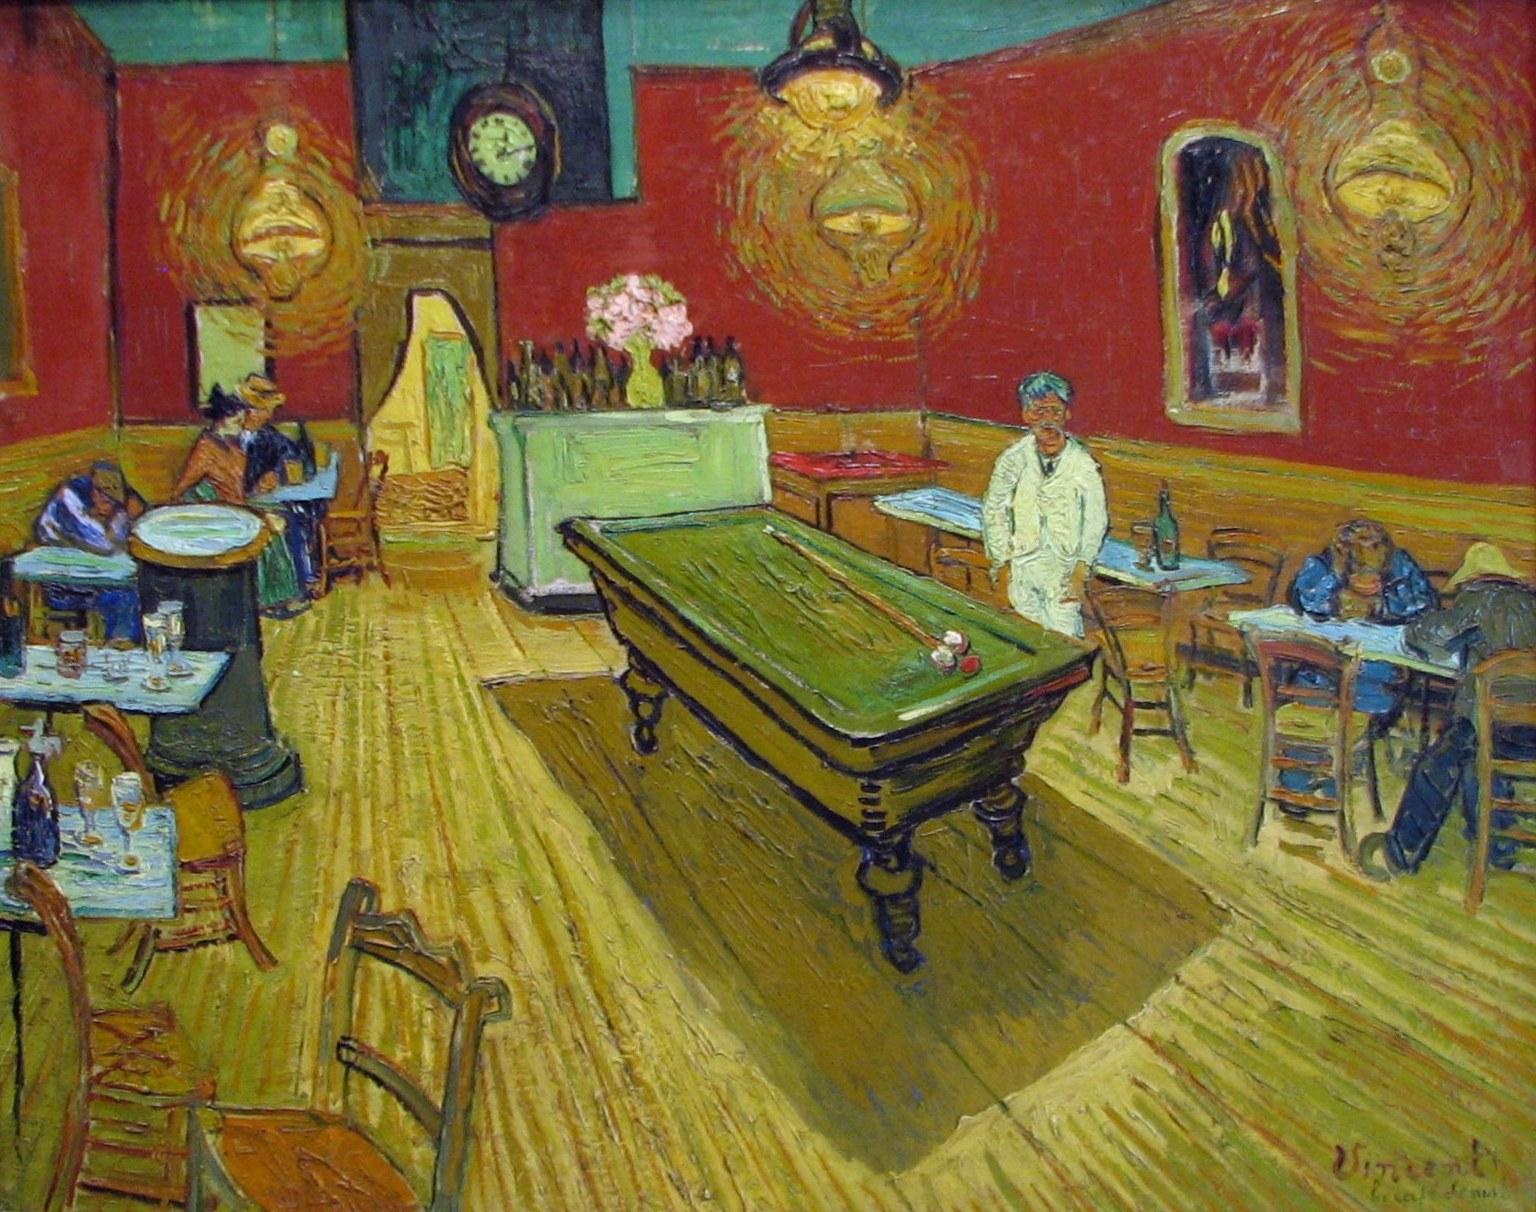 Van_Gogh_The_Night_Cafe.jpg